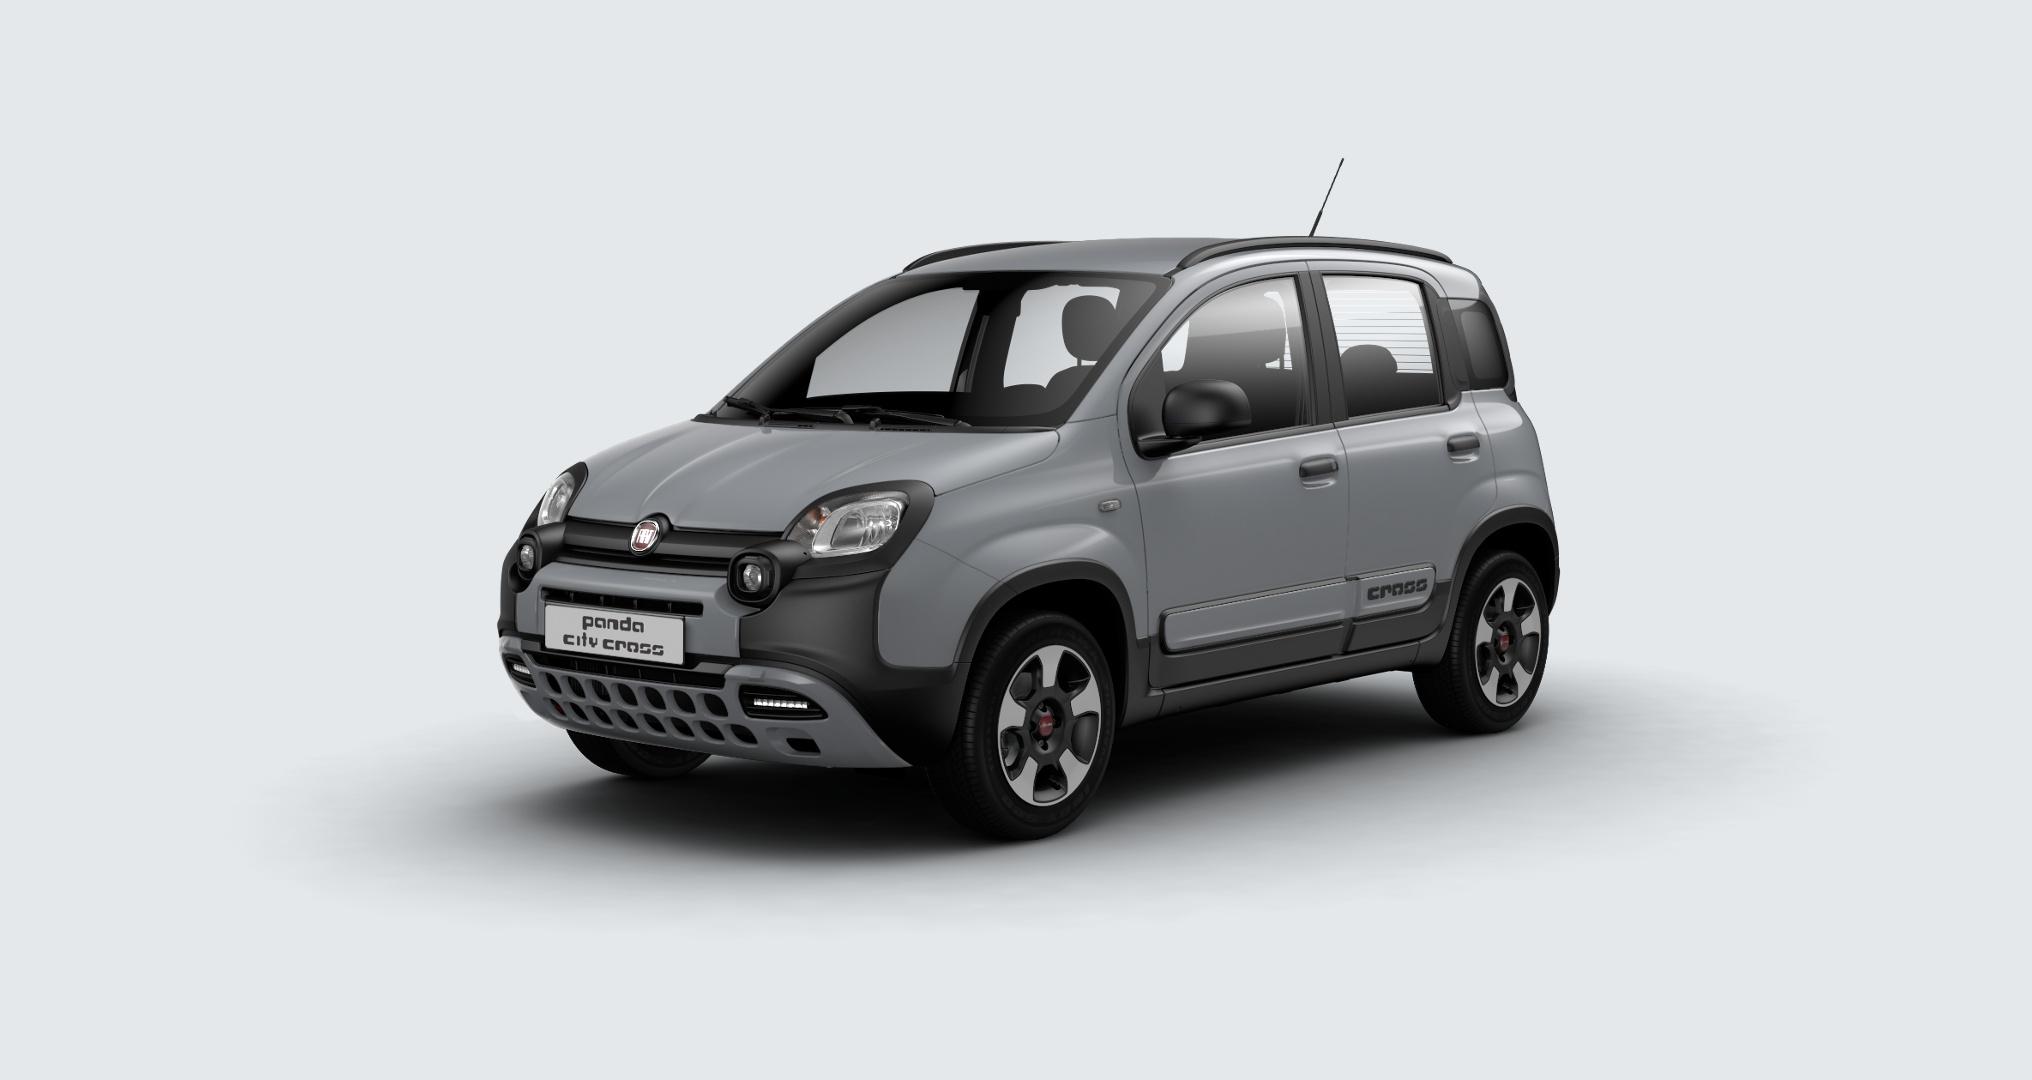 Fiat Panda Turbo Cross.